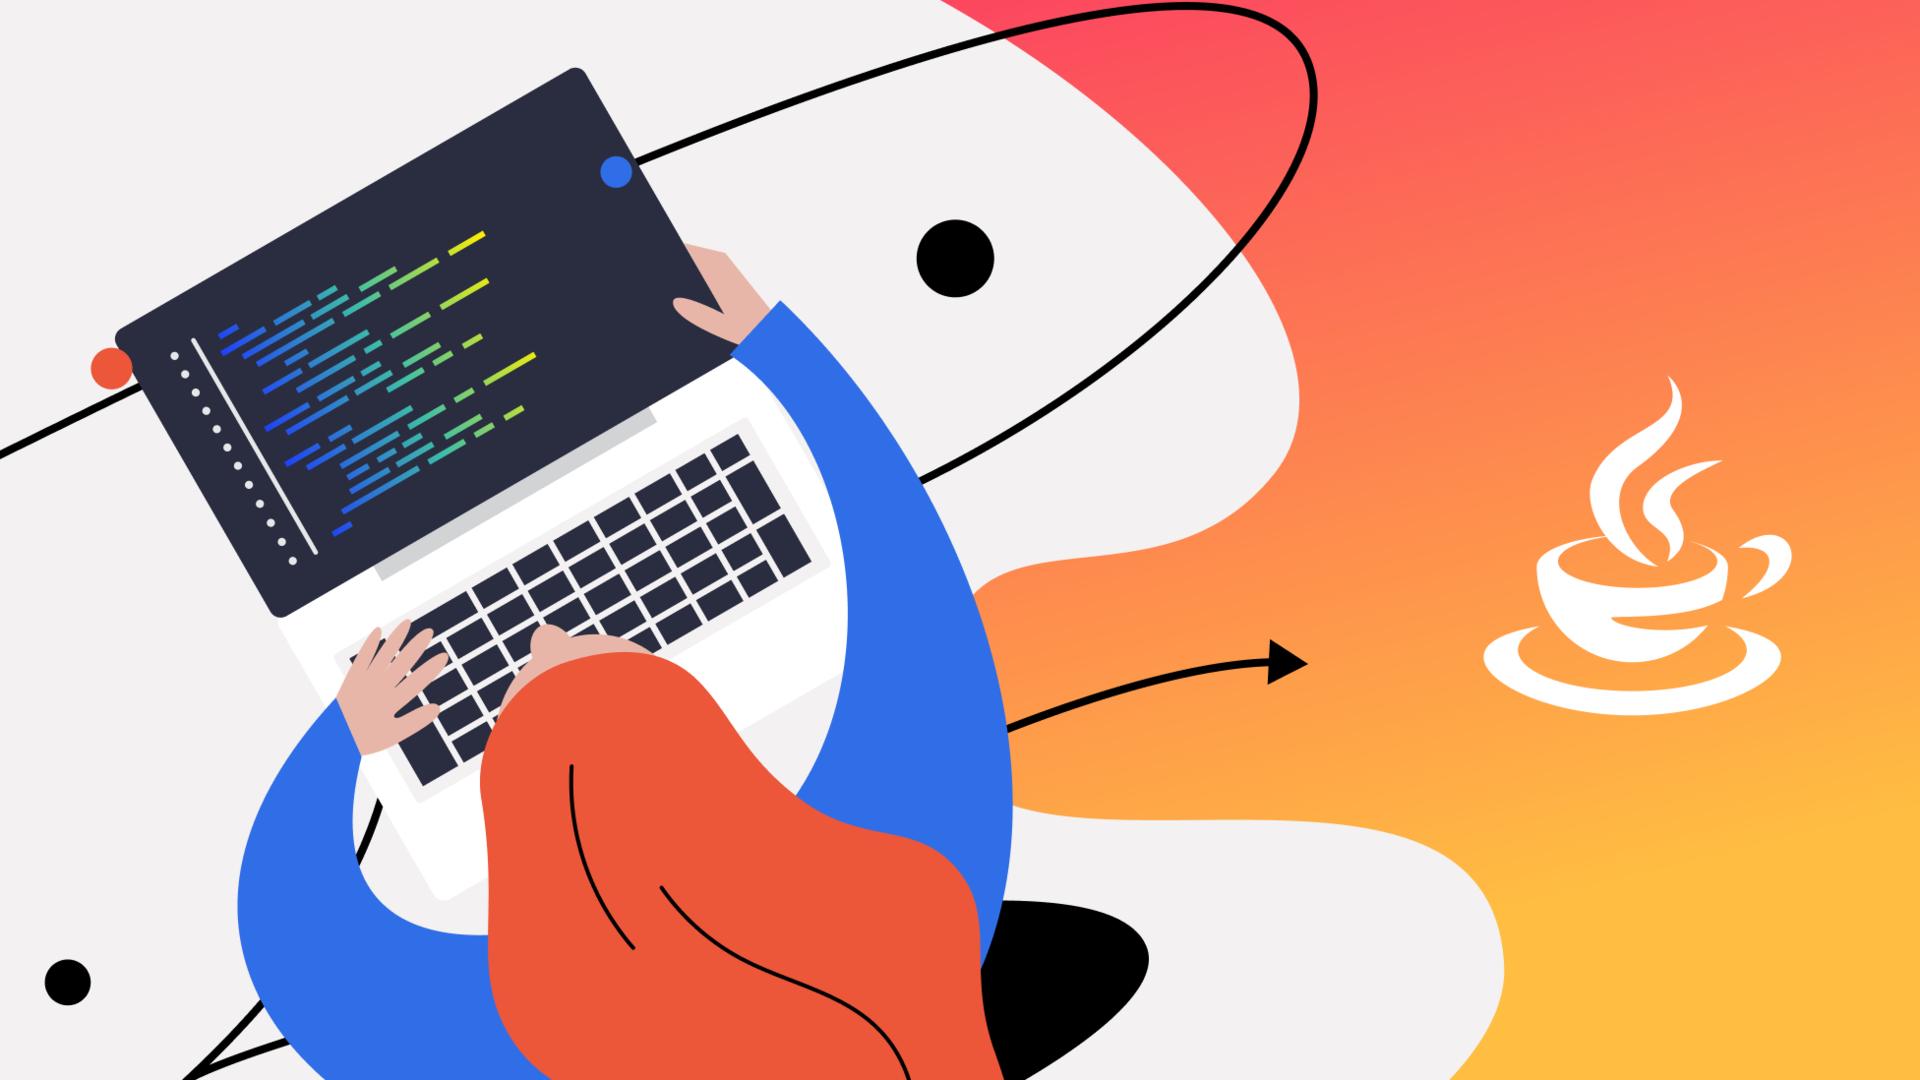 Вебинар Как войти в Java-разработку? фото